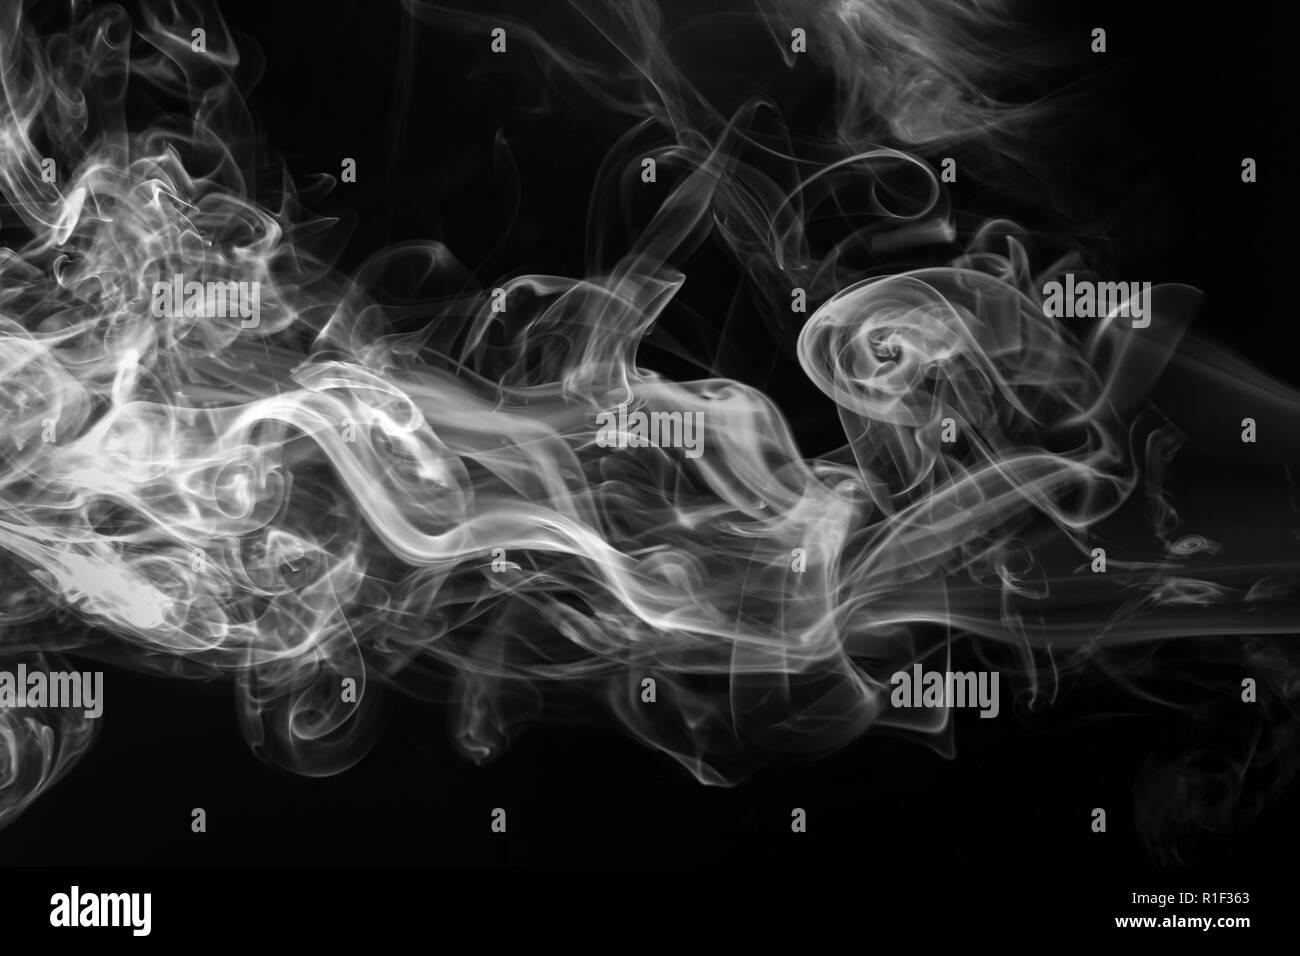 white smoke on black background, darkness concept - Stock Image